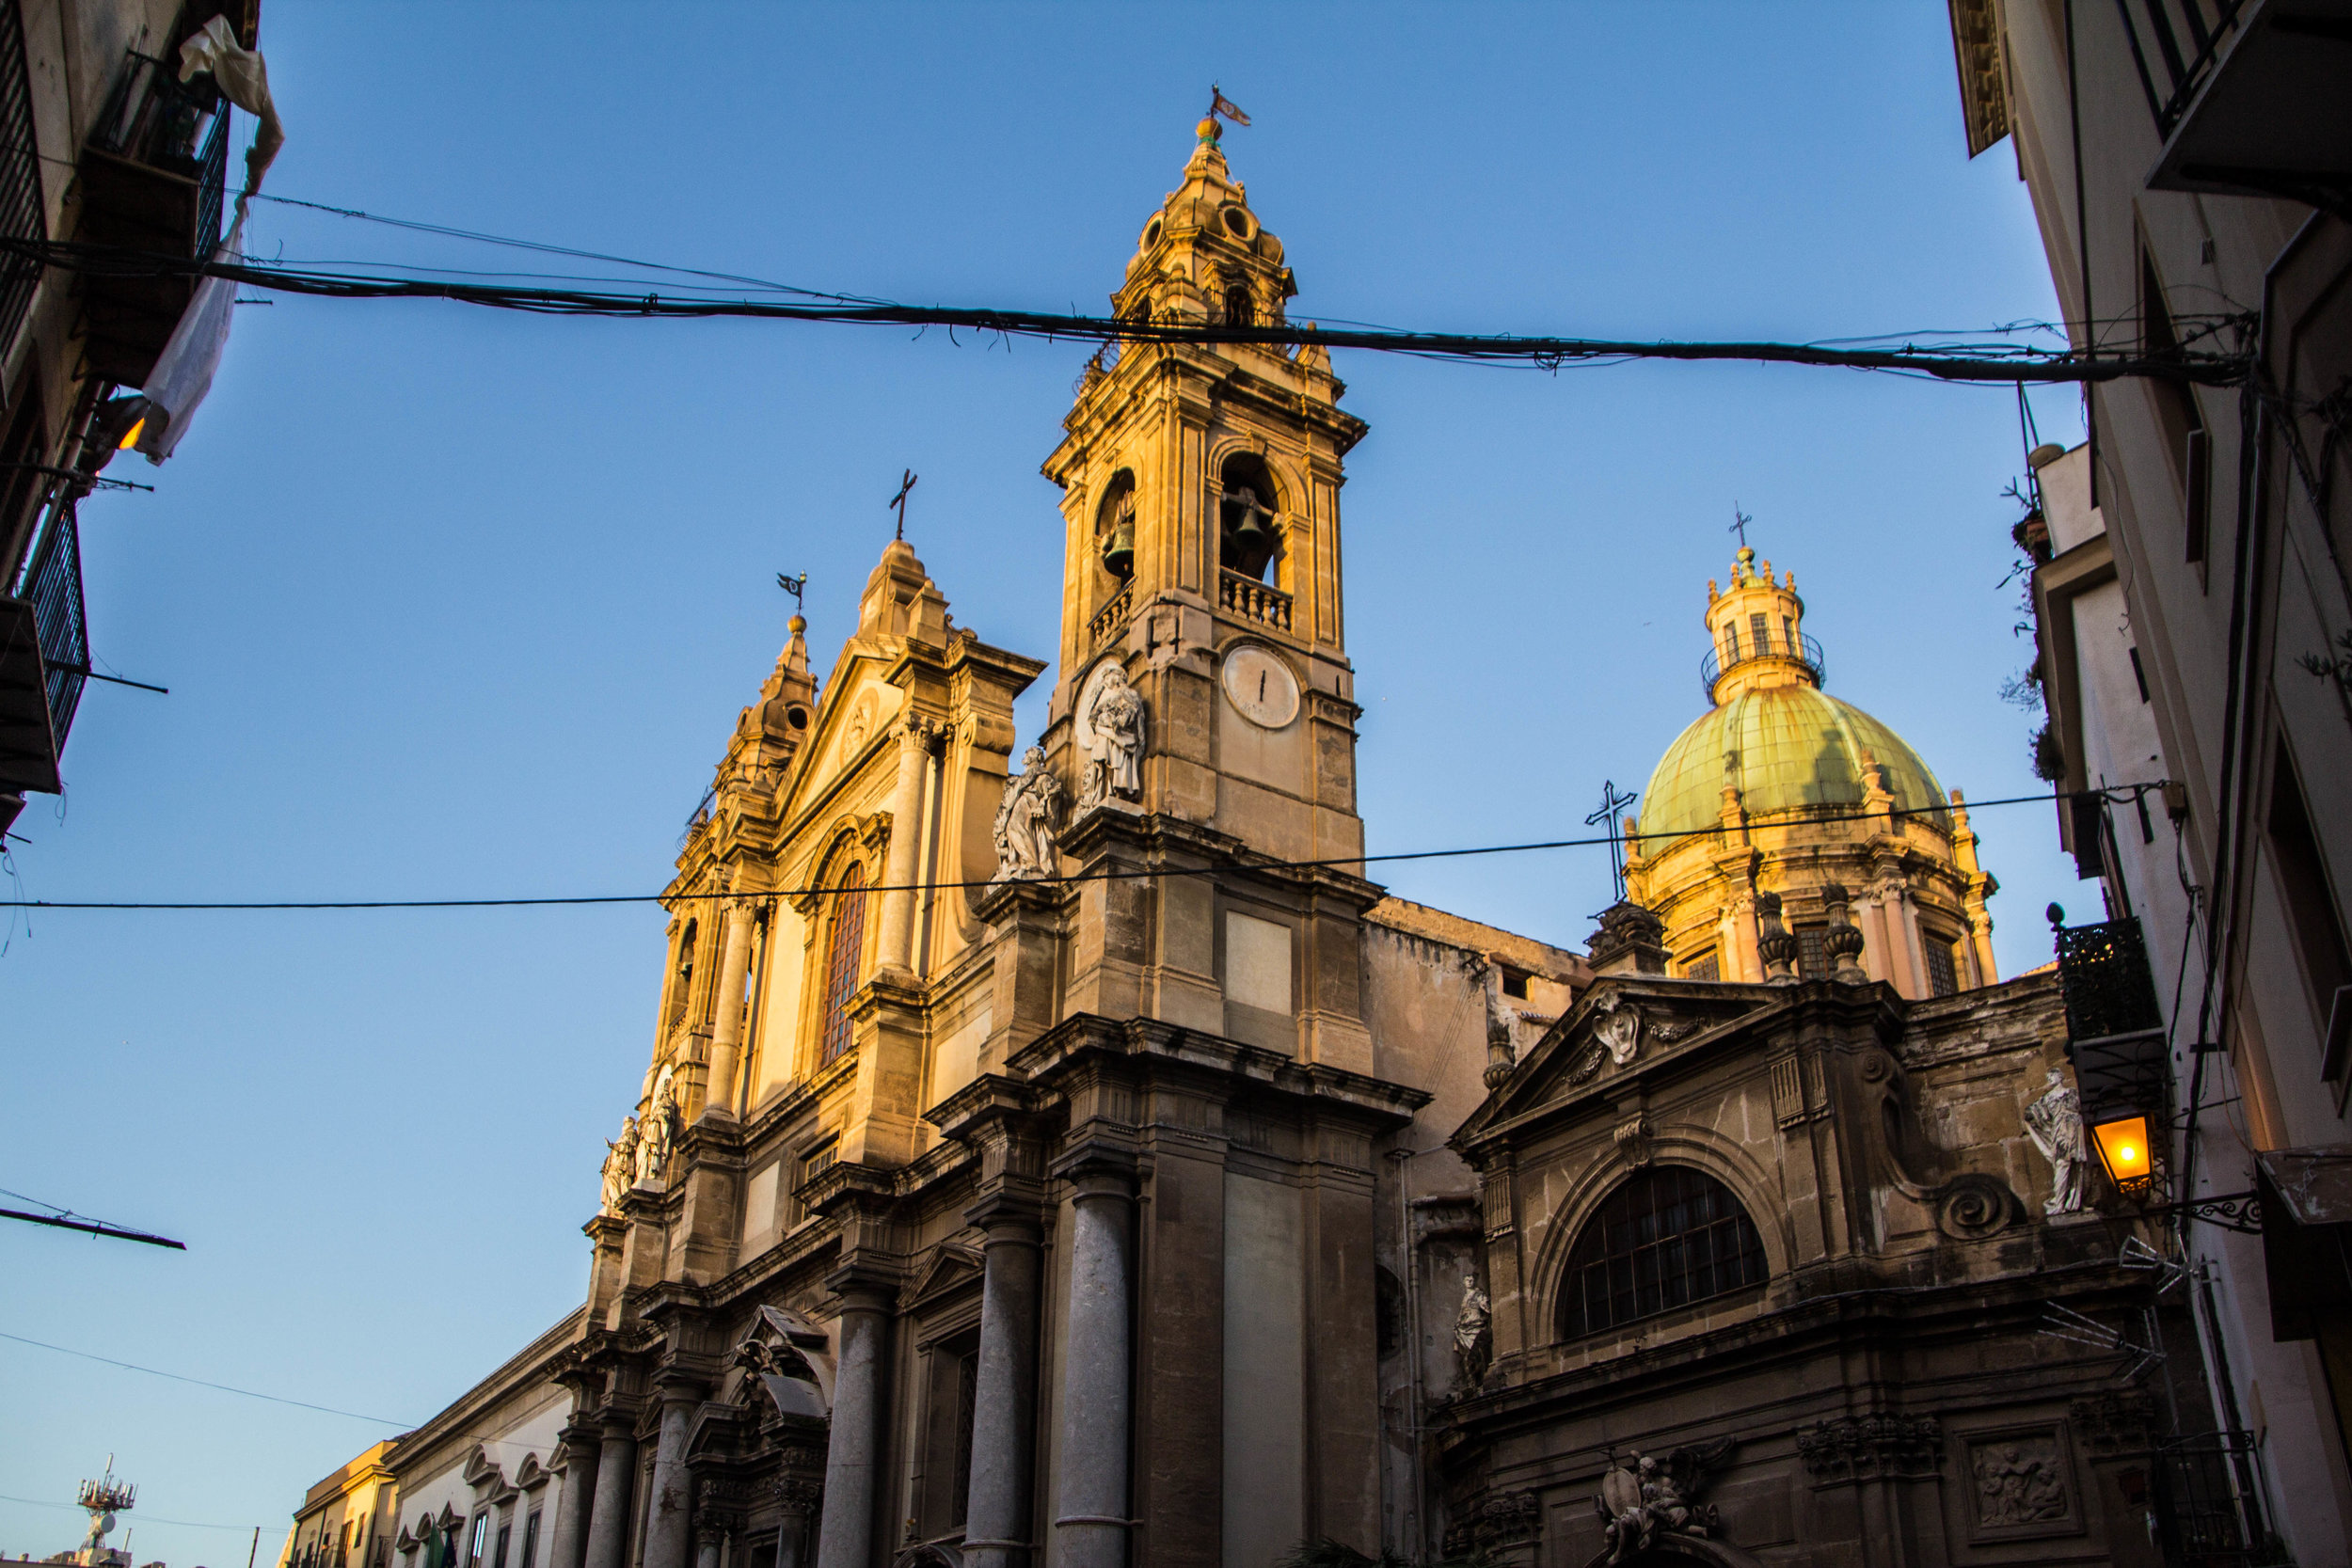 streets-palermo-sicily-17.jpg